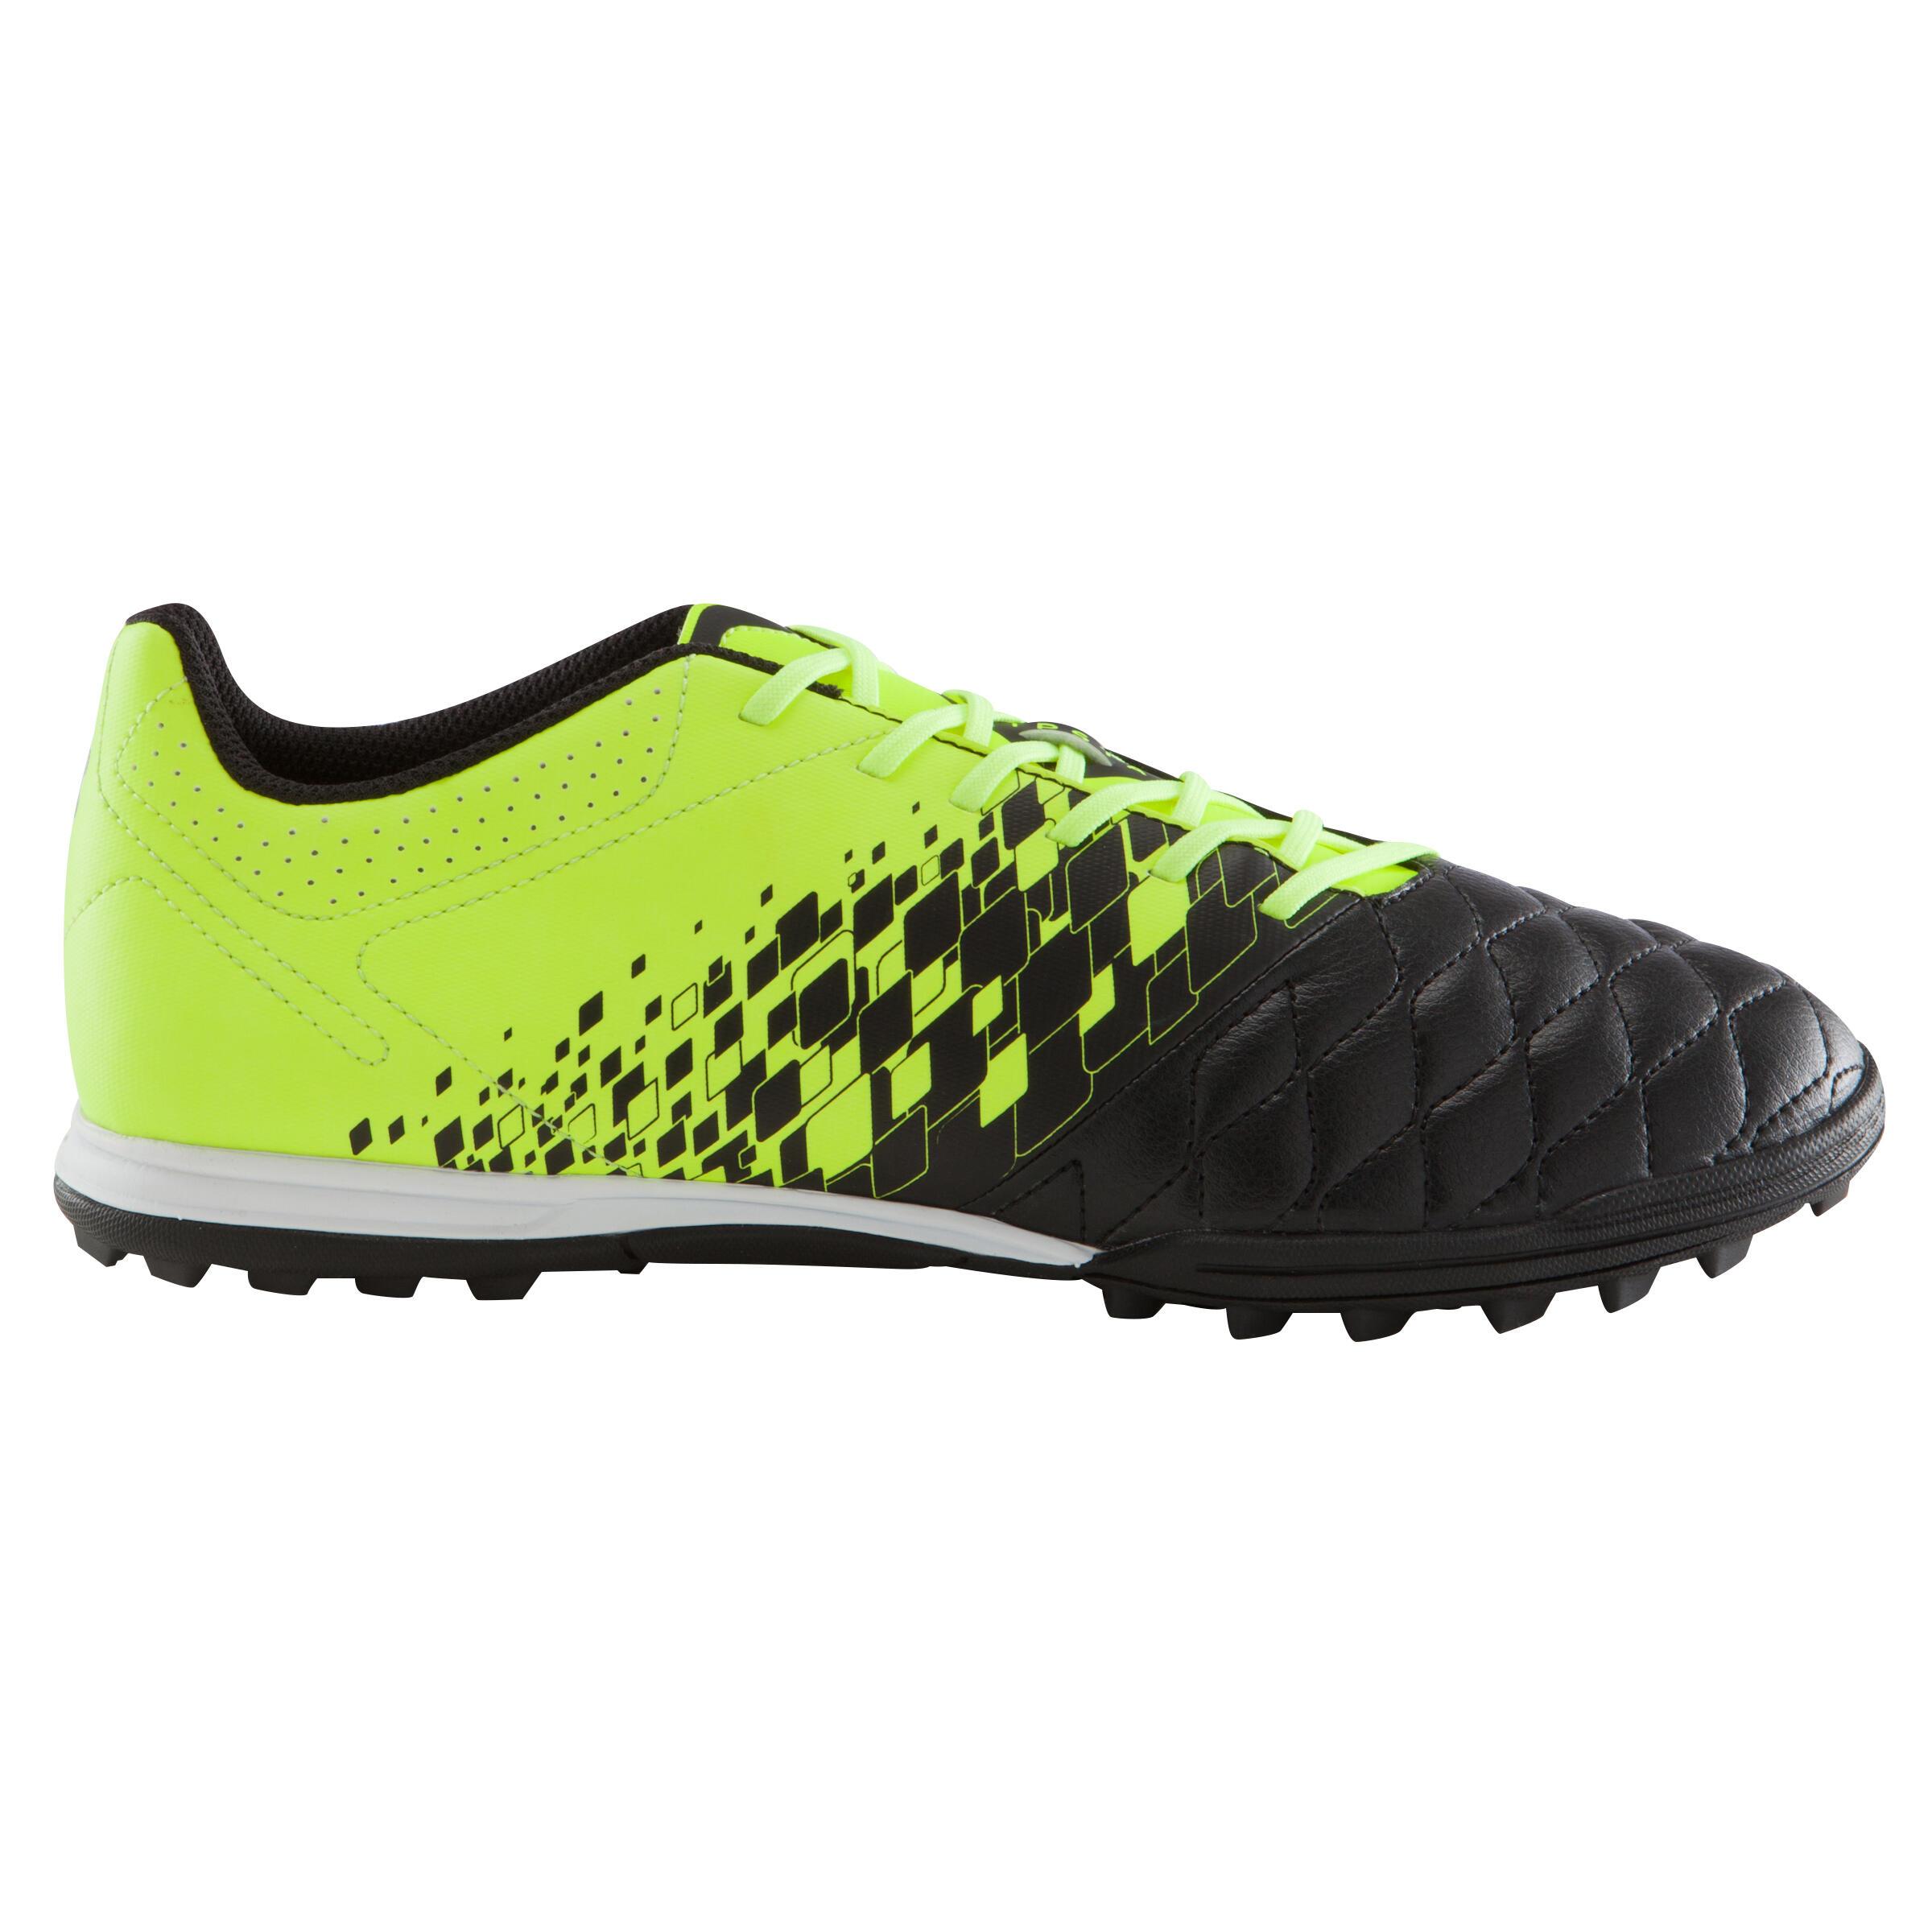 Men's Football Shoes Agility 500 HG - Black/Yellow